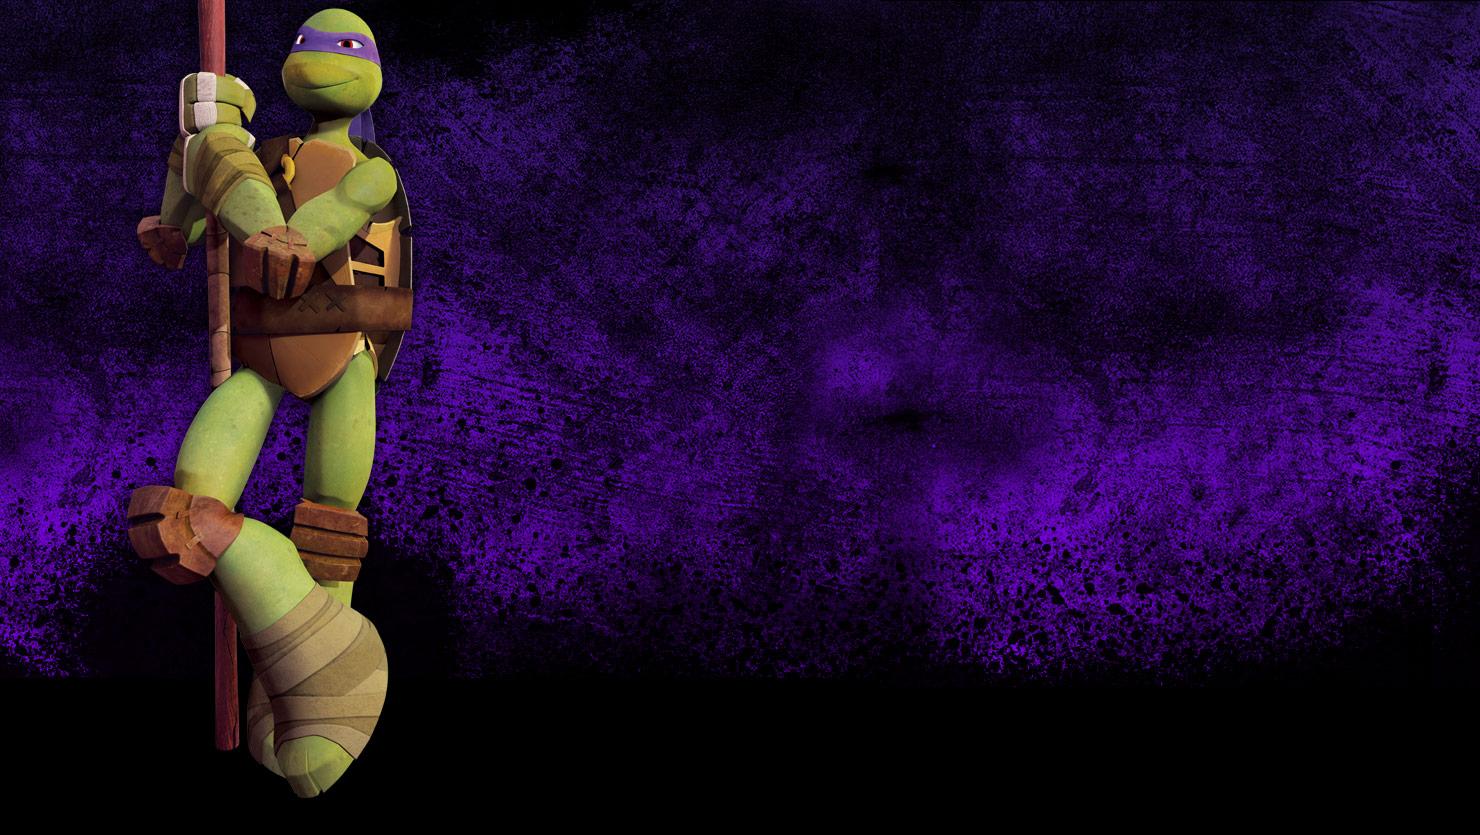 TMNT 2012 Donatello wallpaper.jpg